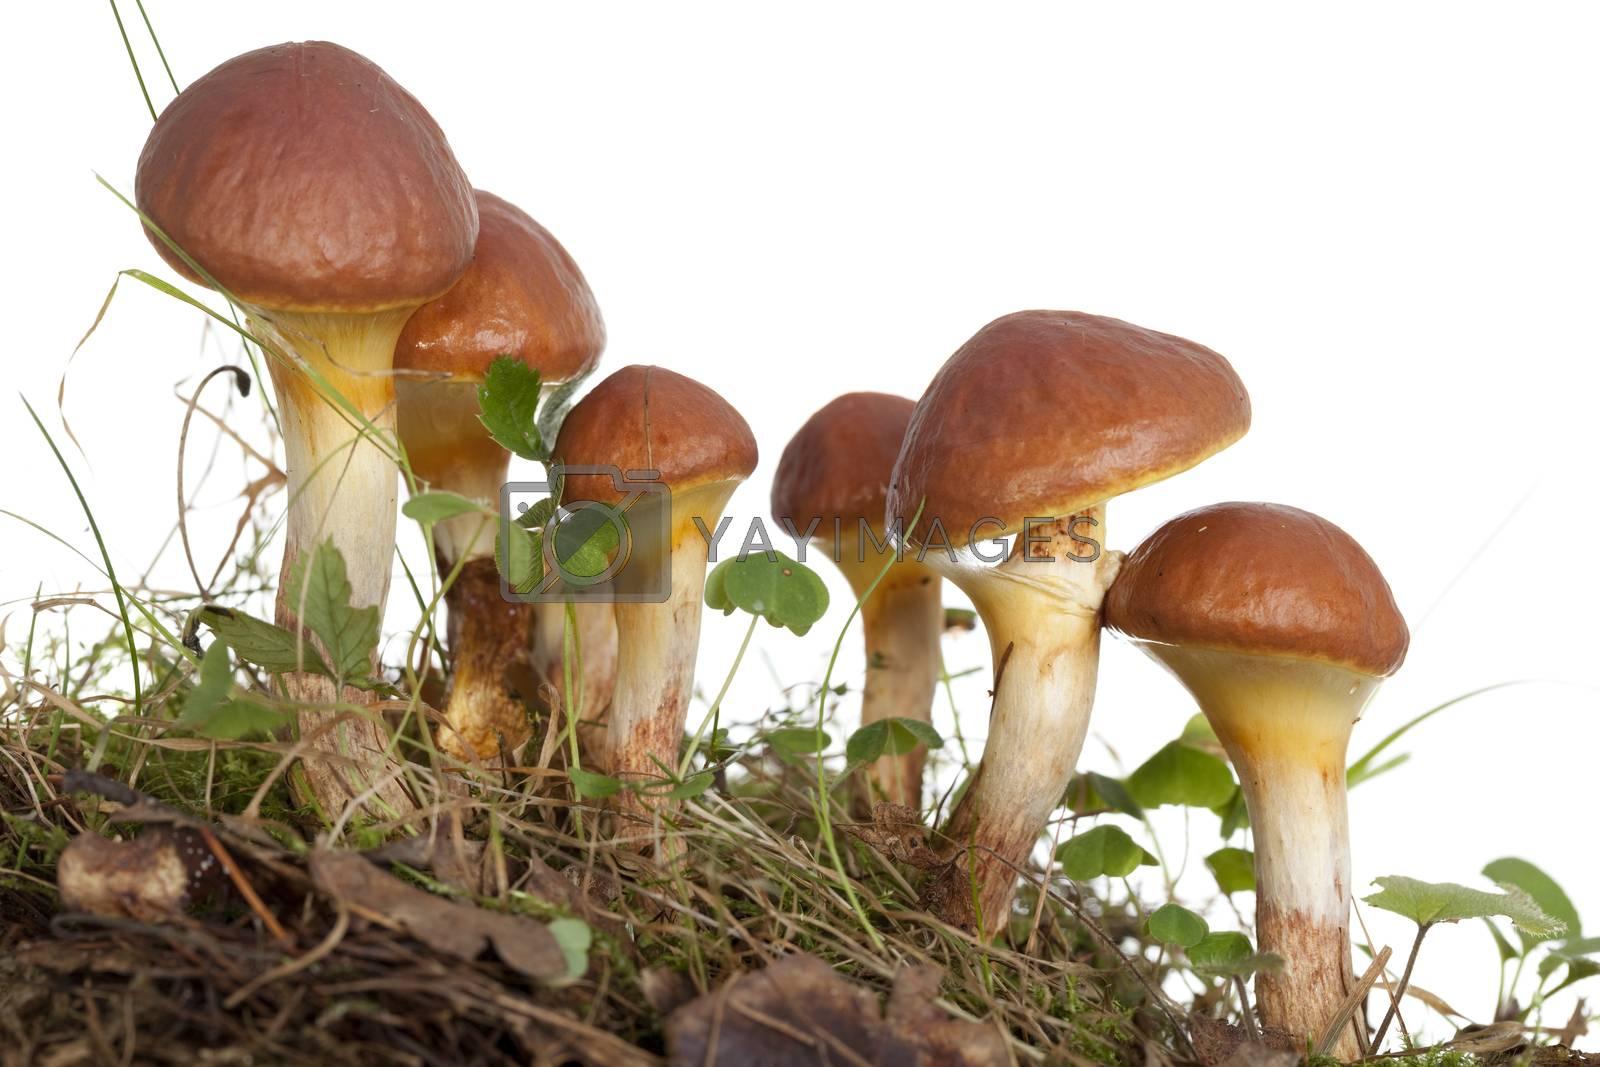 edible mushrooms (Suillus grevillei ) on white background